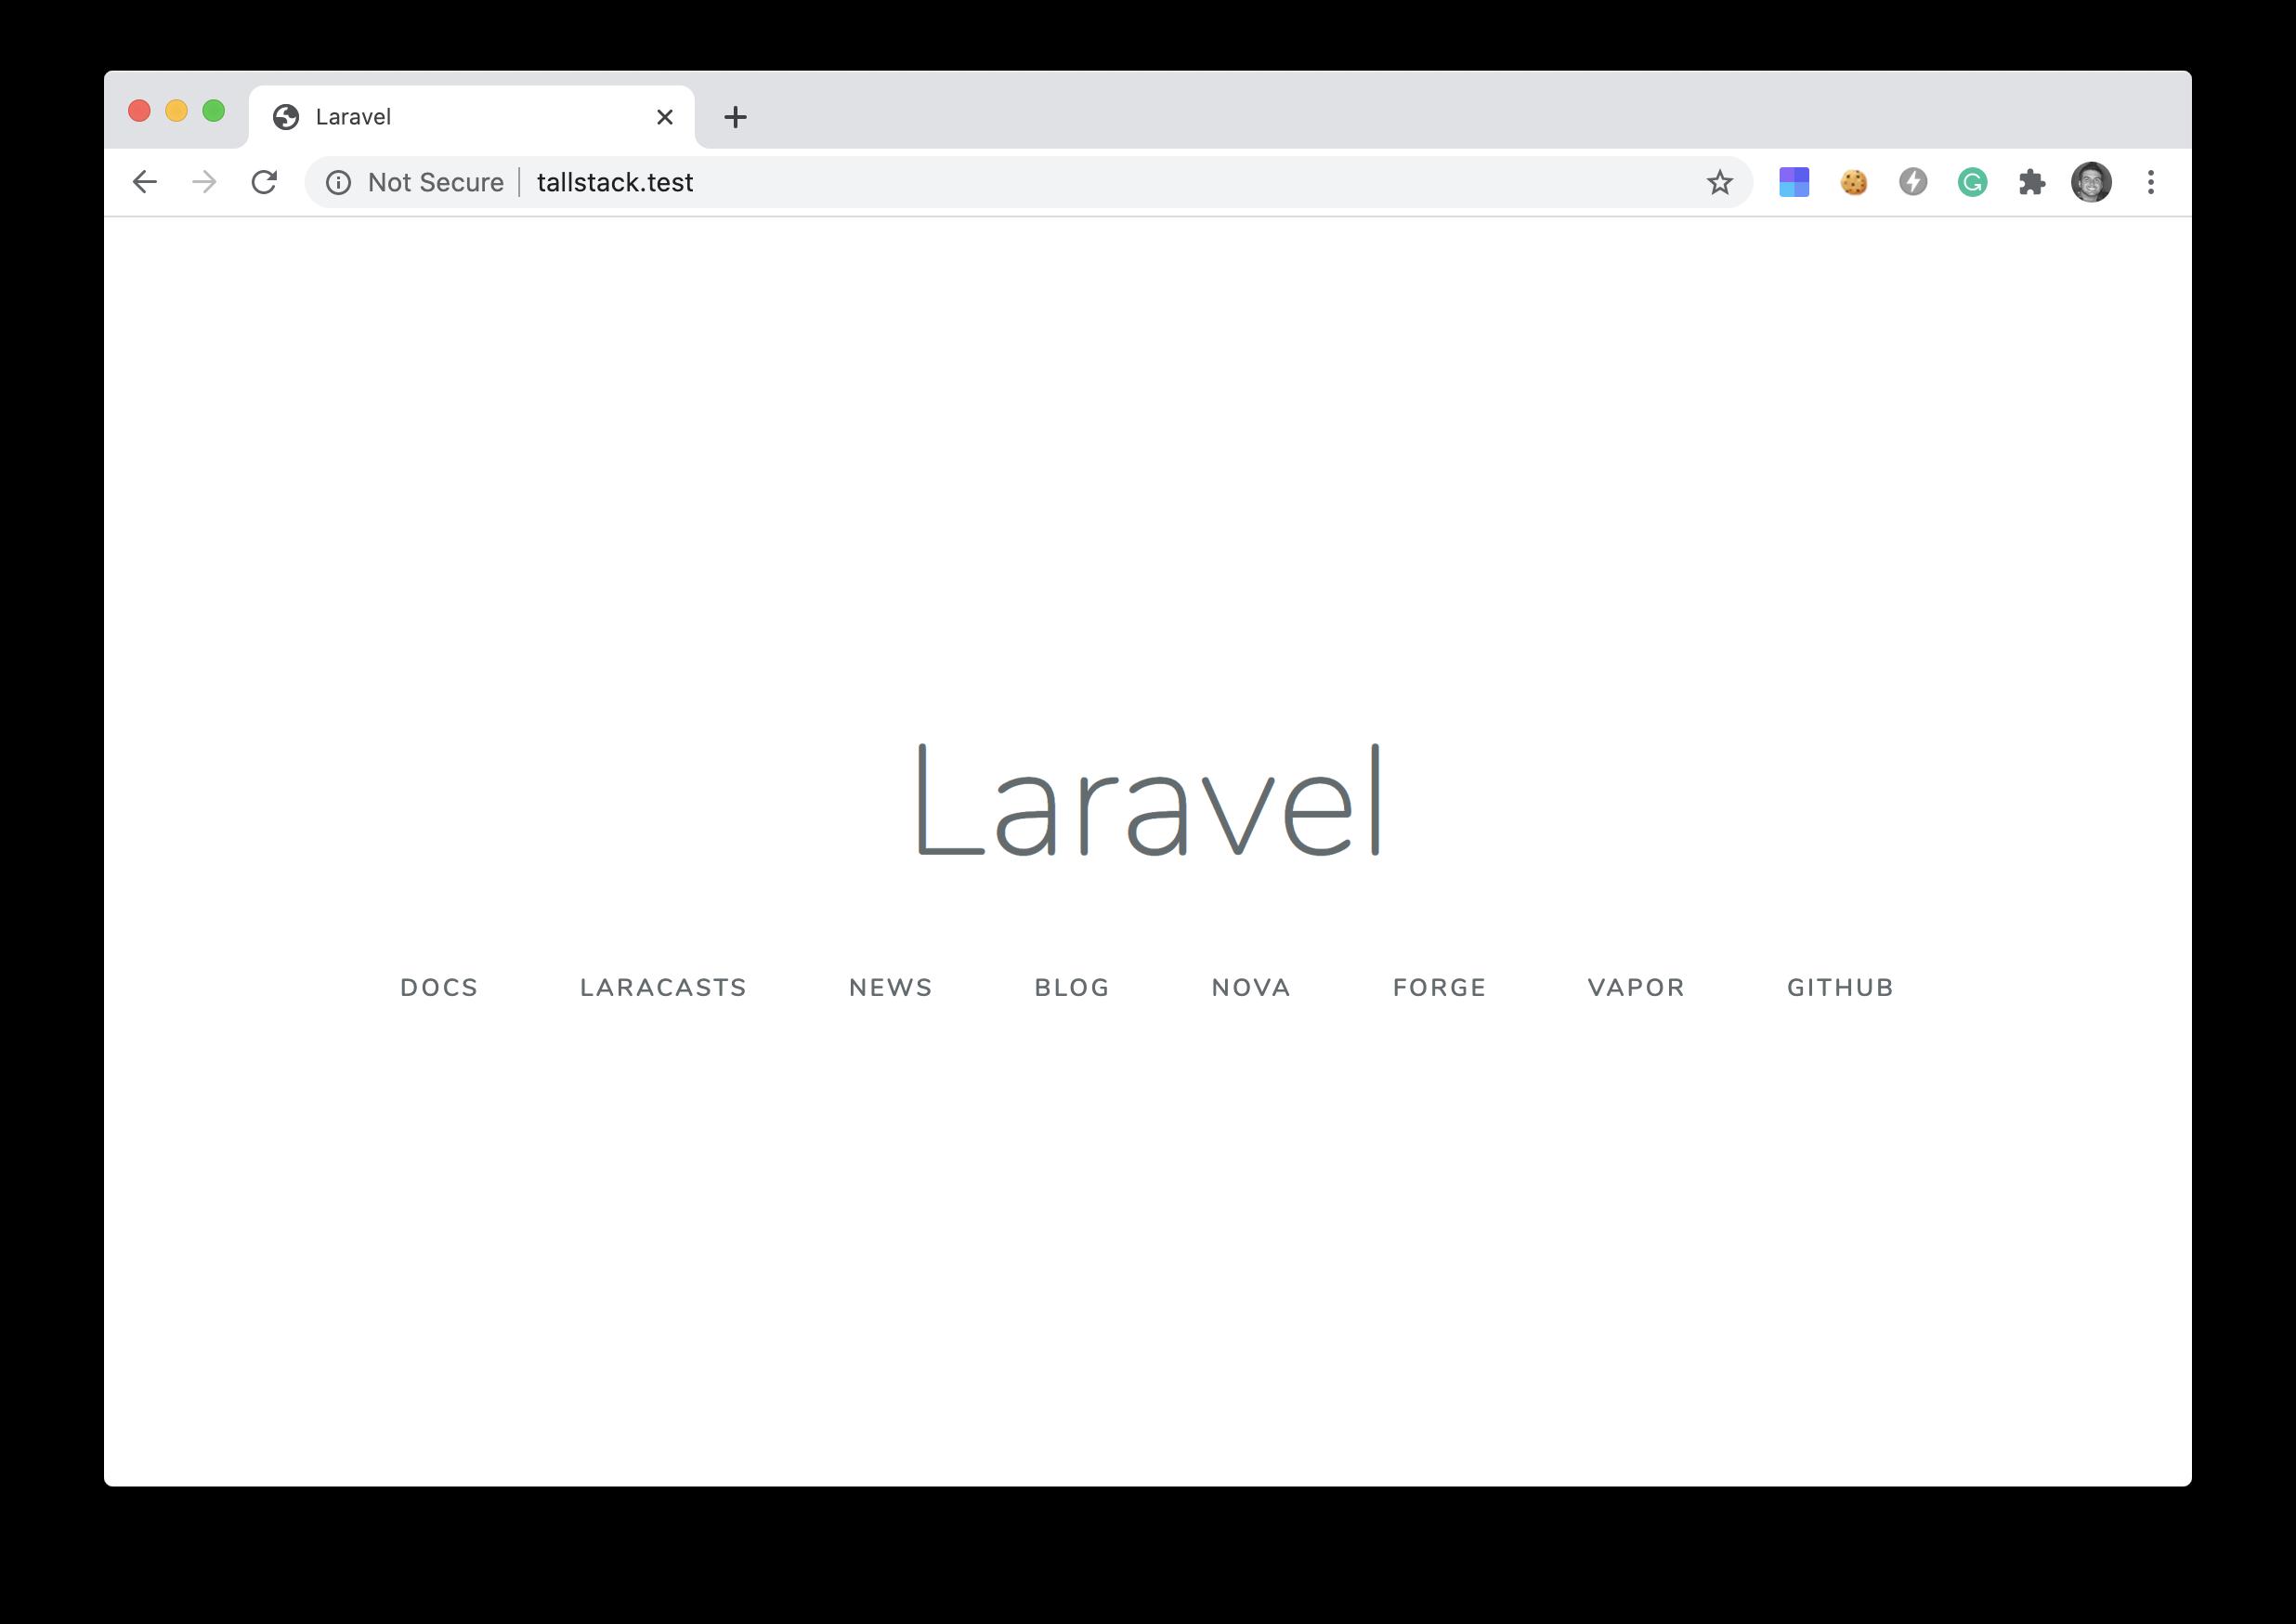 laraval-tallstack.png